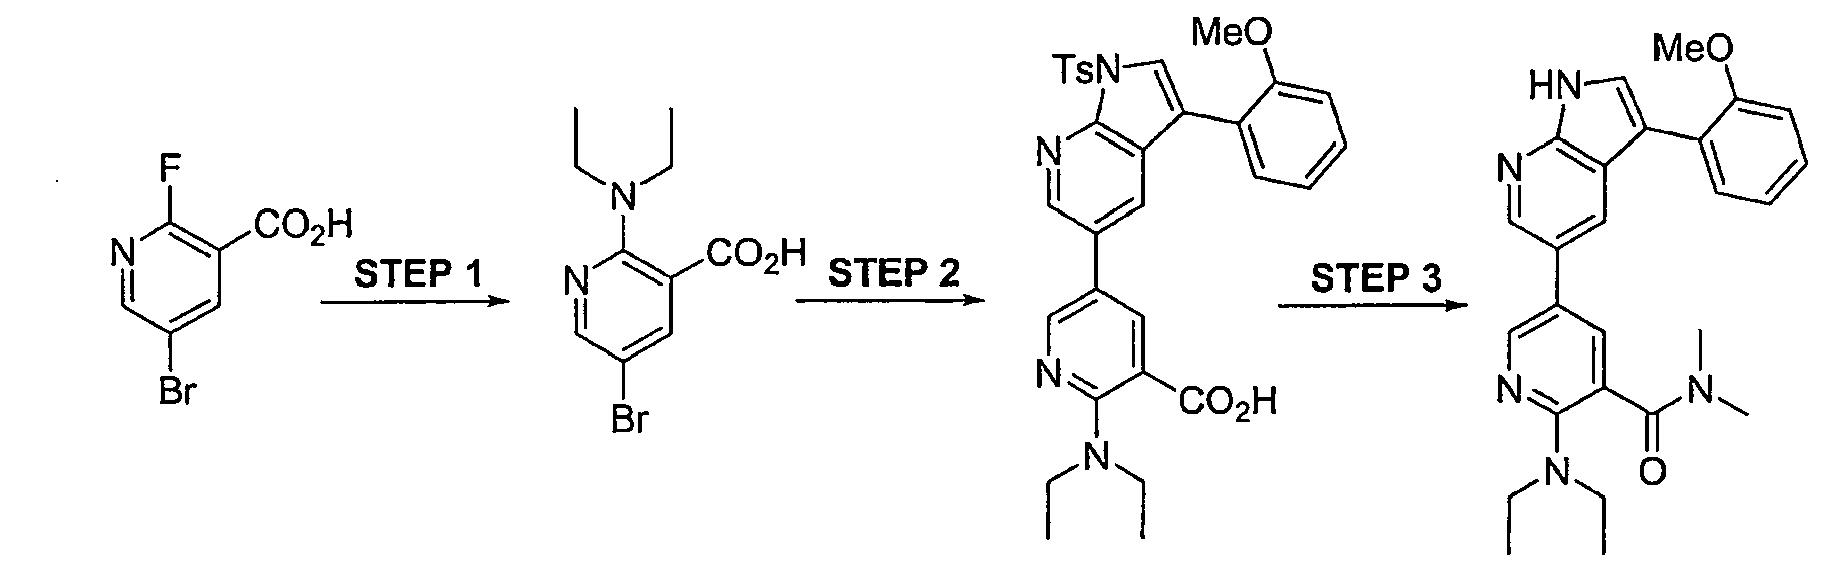 Figure imgb0520